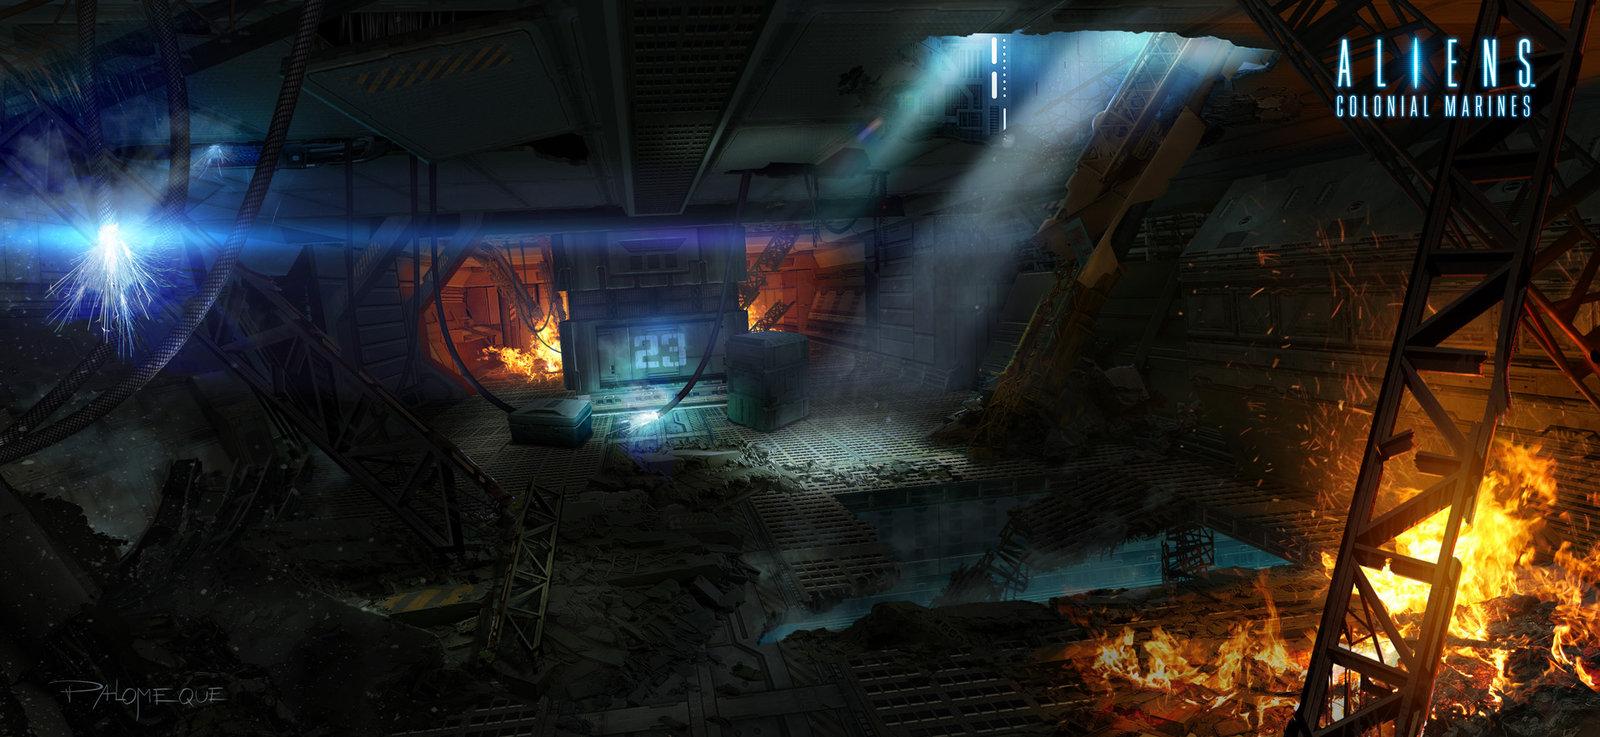 ACM Interior Wreckage